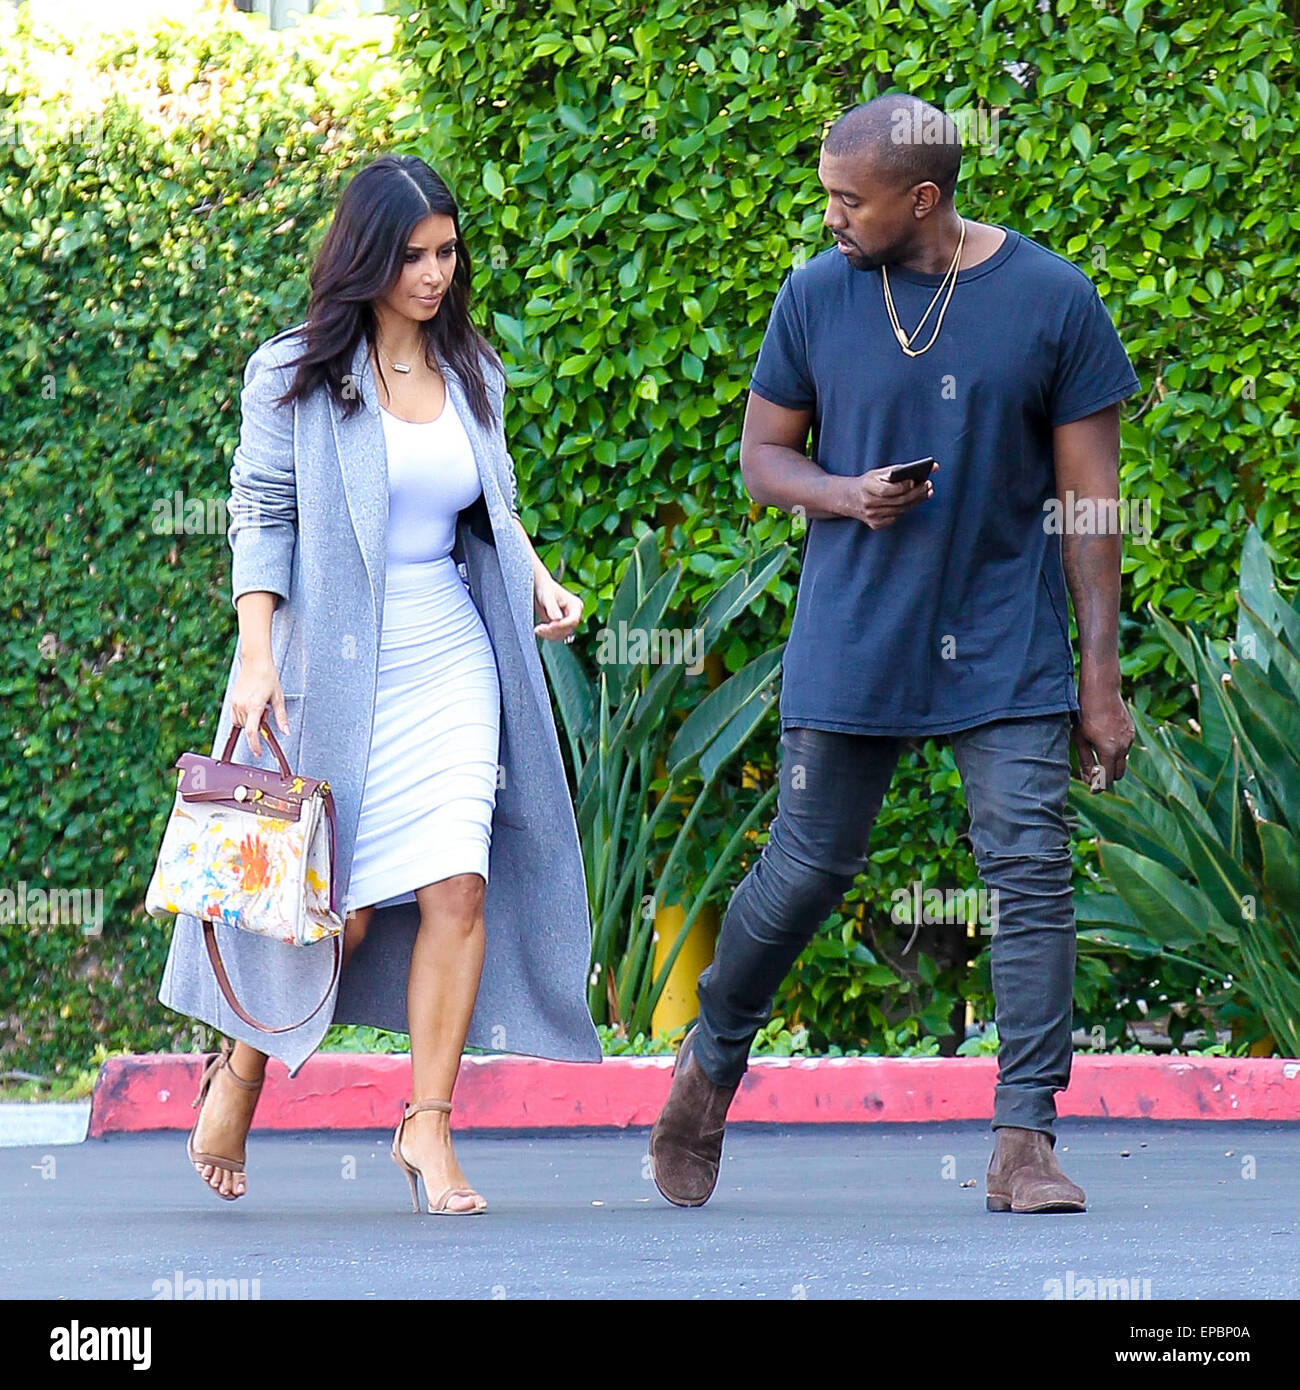 hermes wallet price - Kanye West And Kim Kardashian, Who's Holding An Original Hermes ...